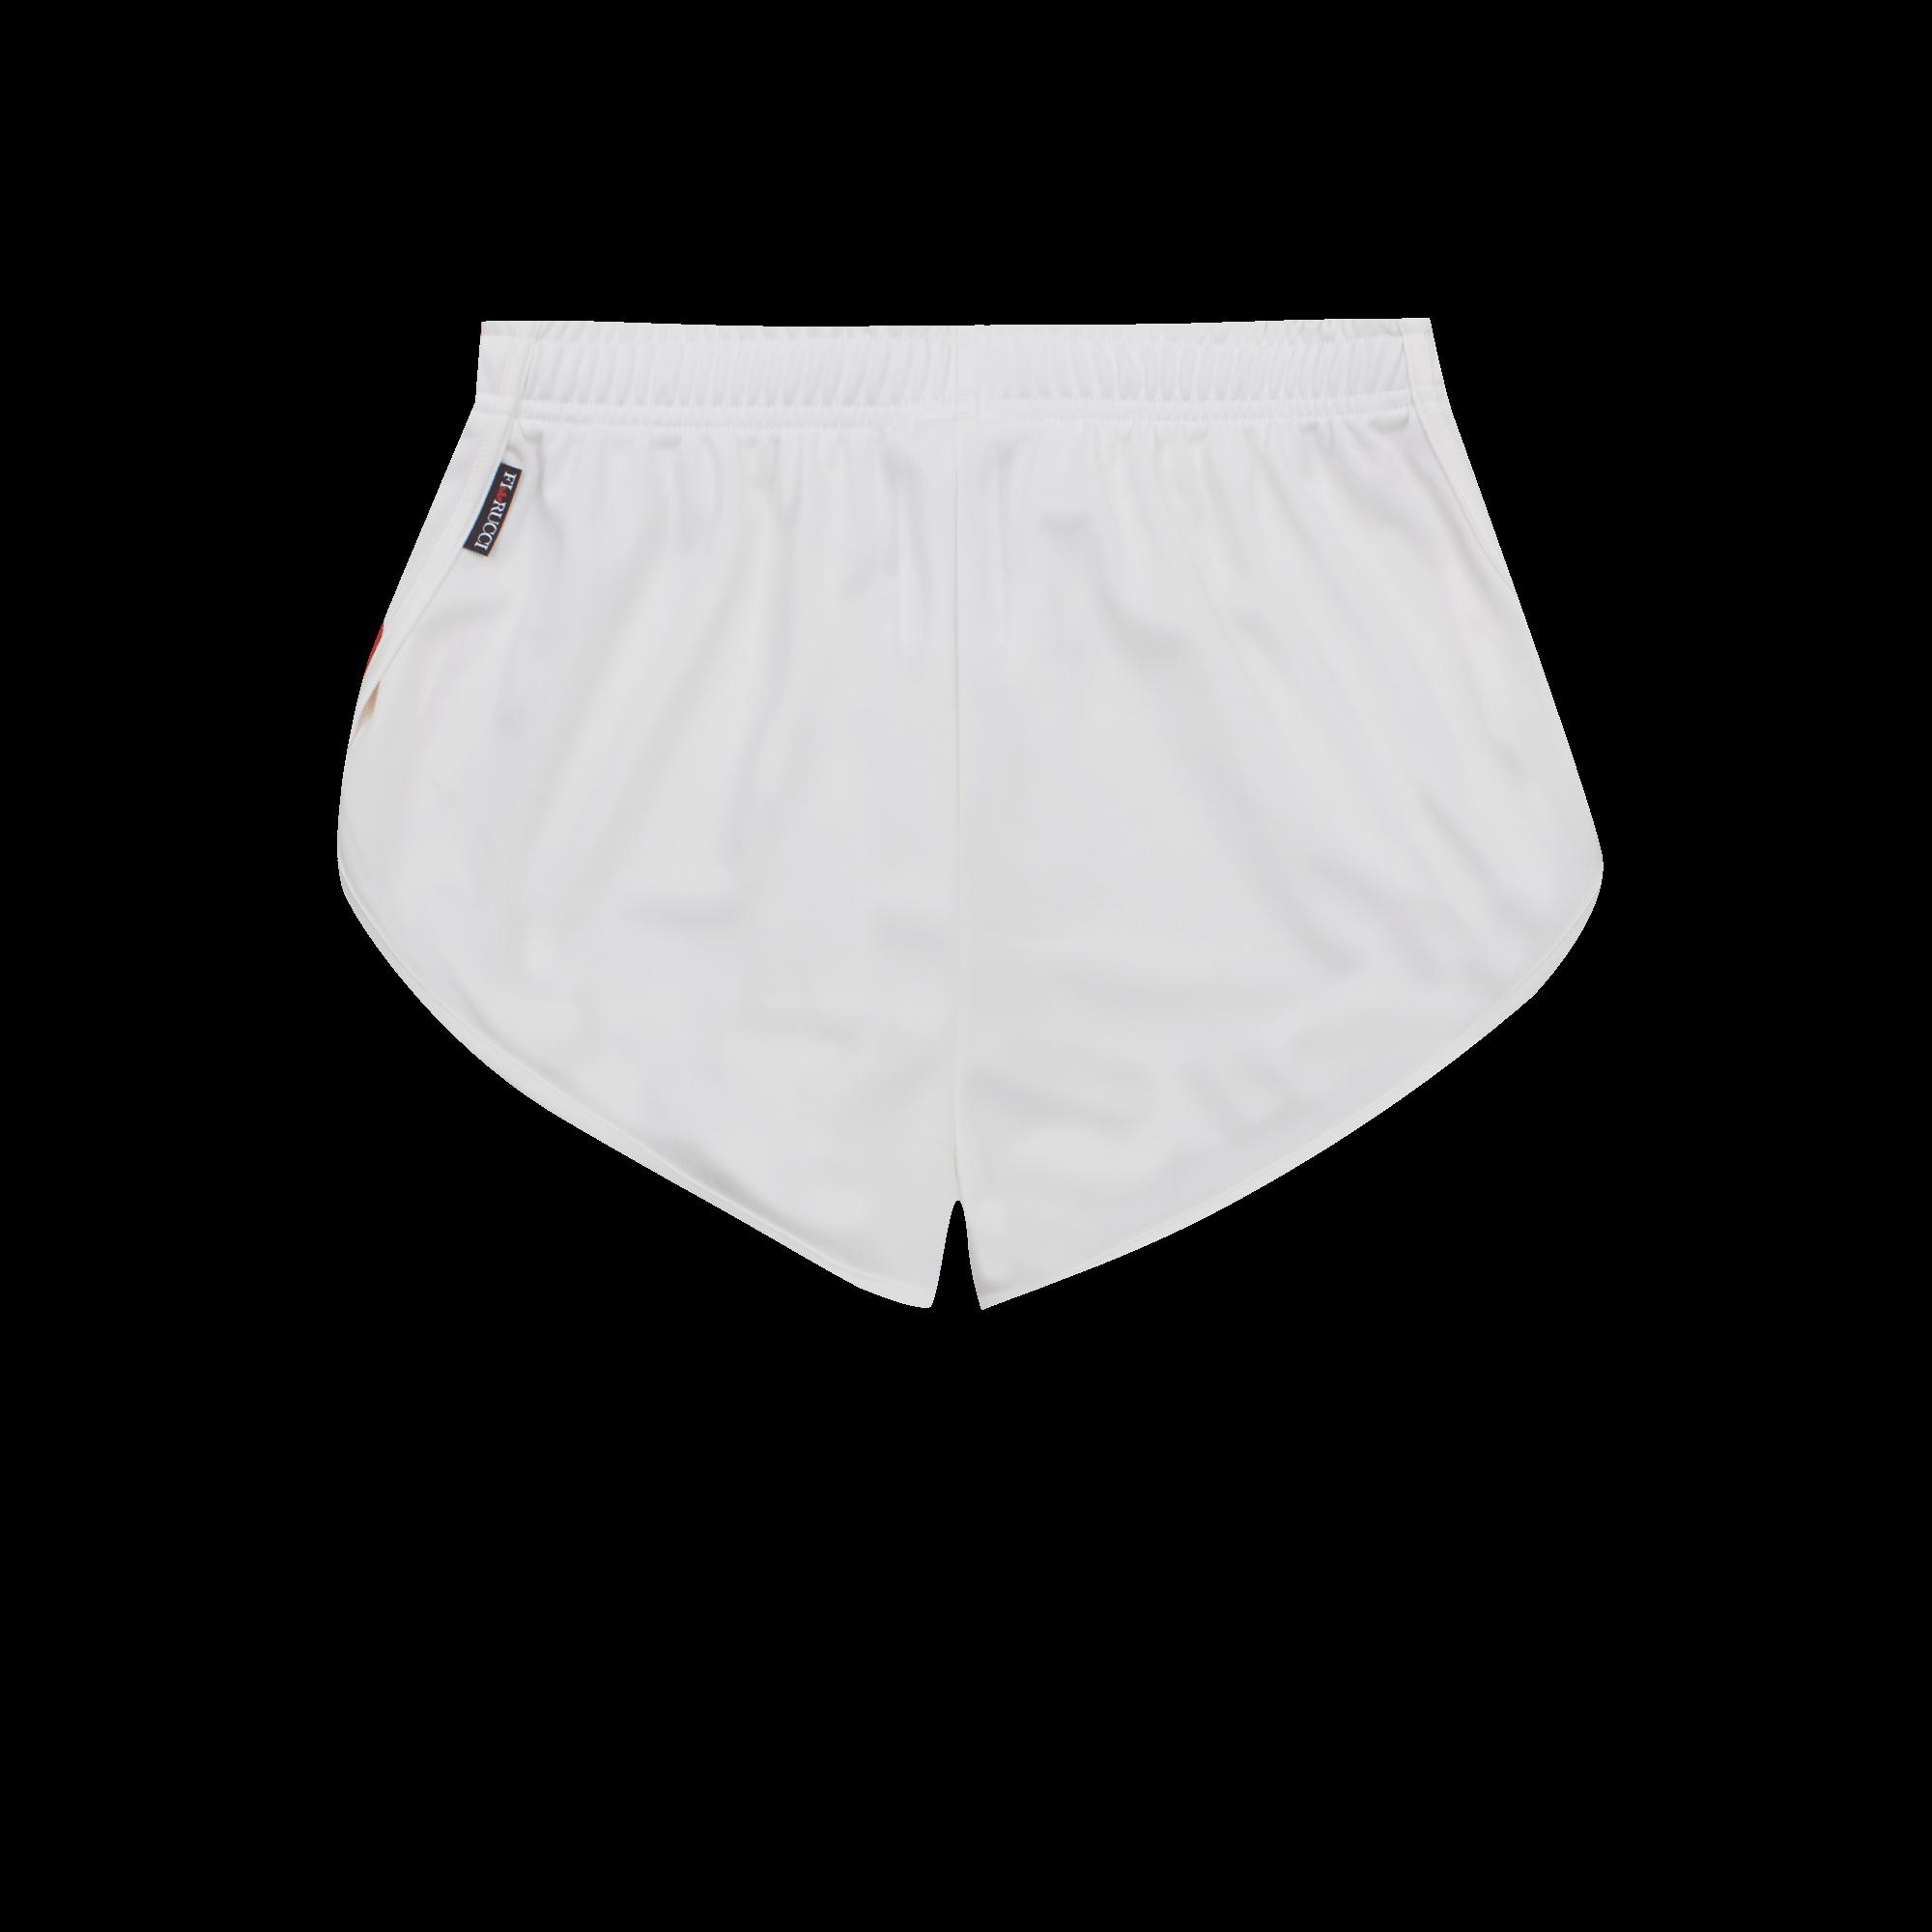 Fiorucci Vintage Short white / red